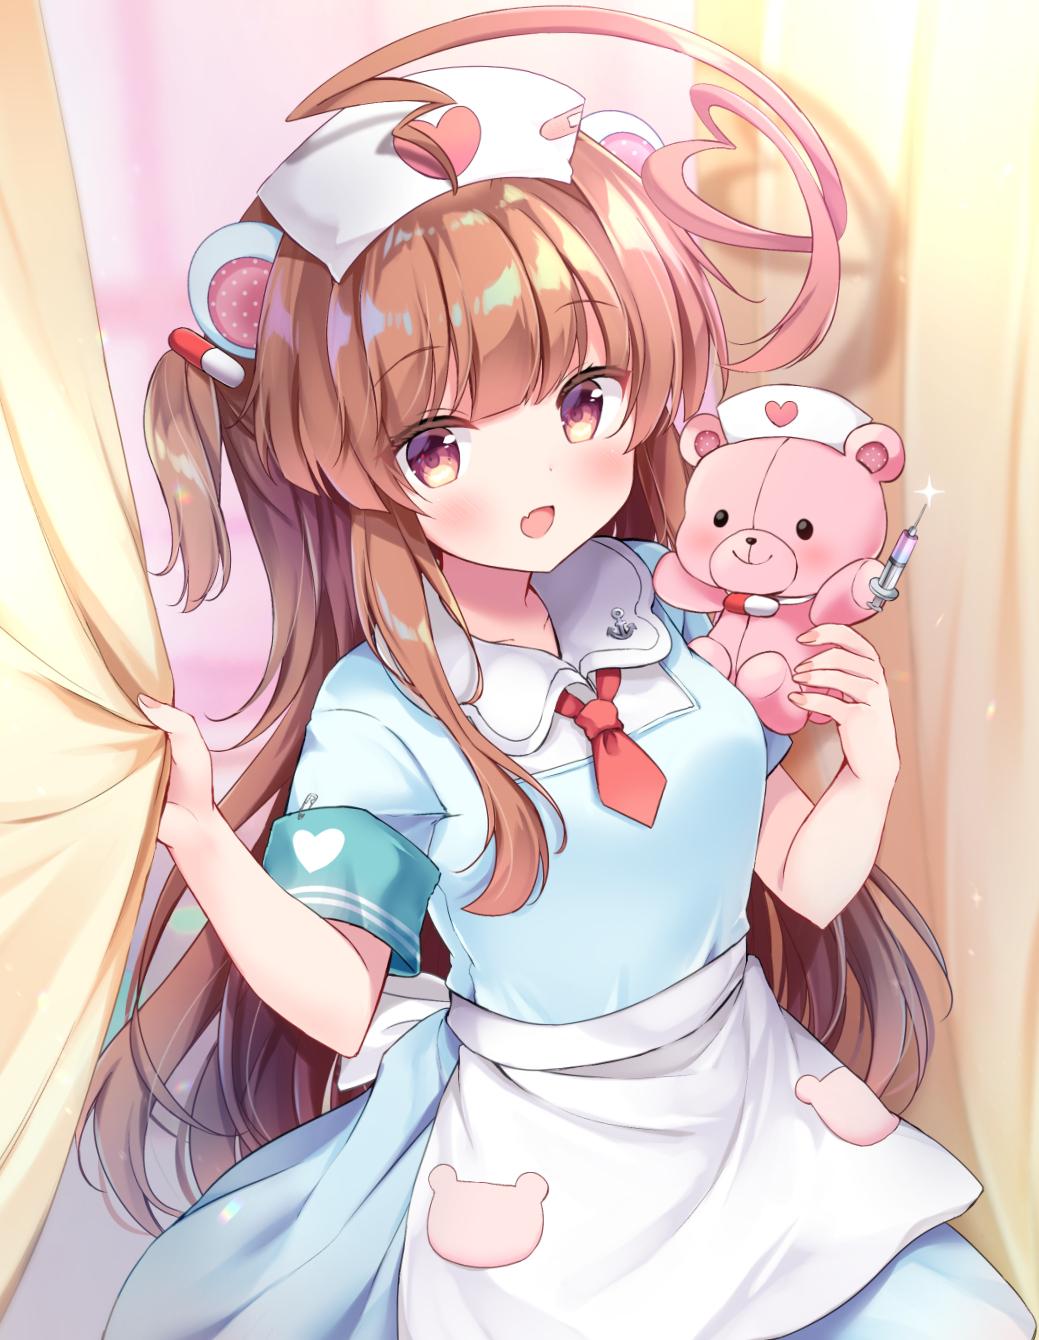 【P站画师】萌妹子!好多萌妹子!日本画师まさよ的插画作品-玩吧ACG